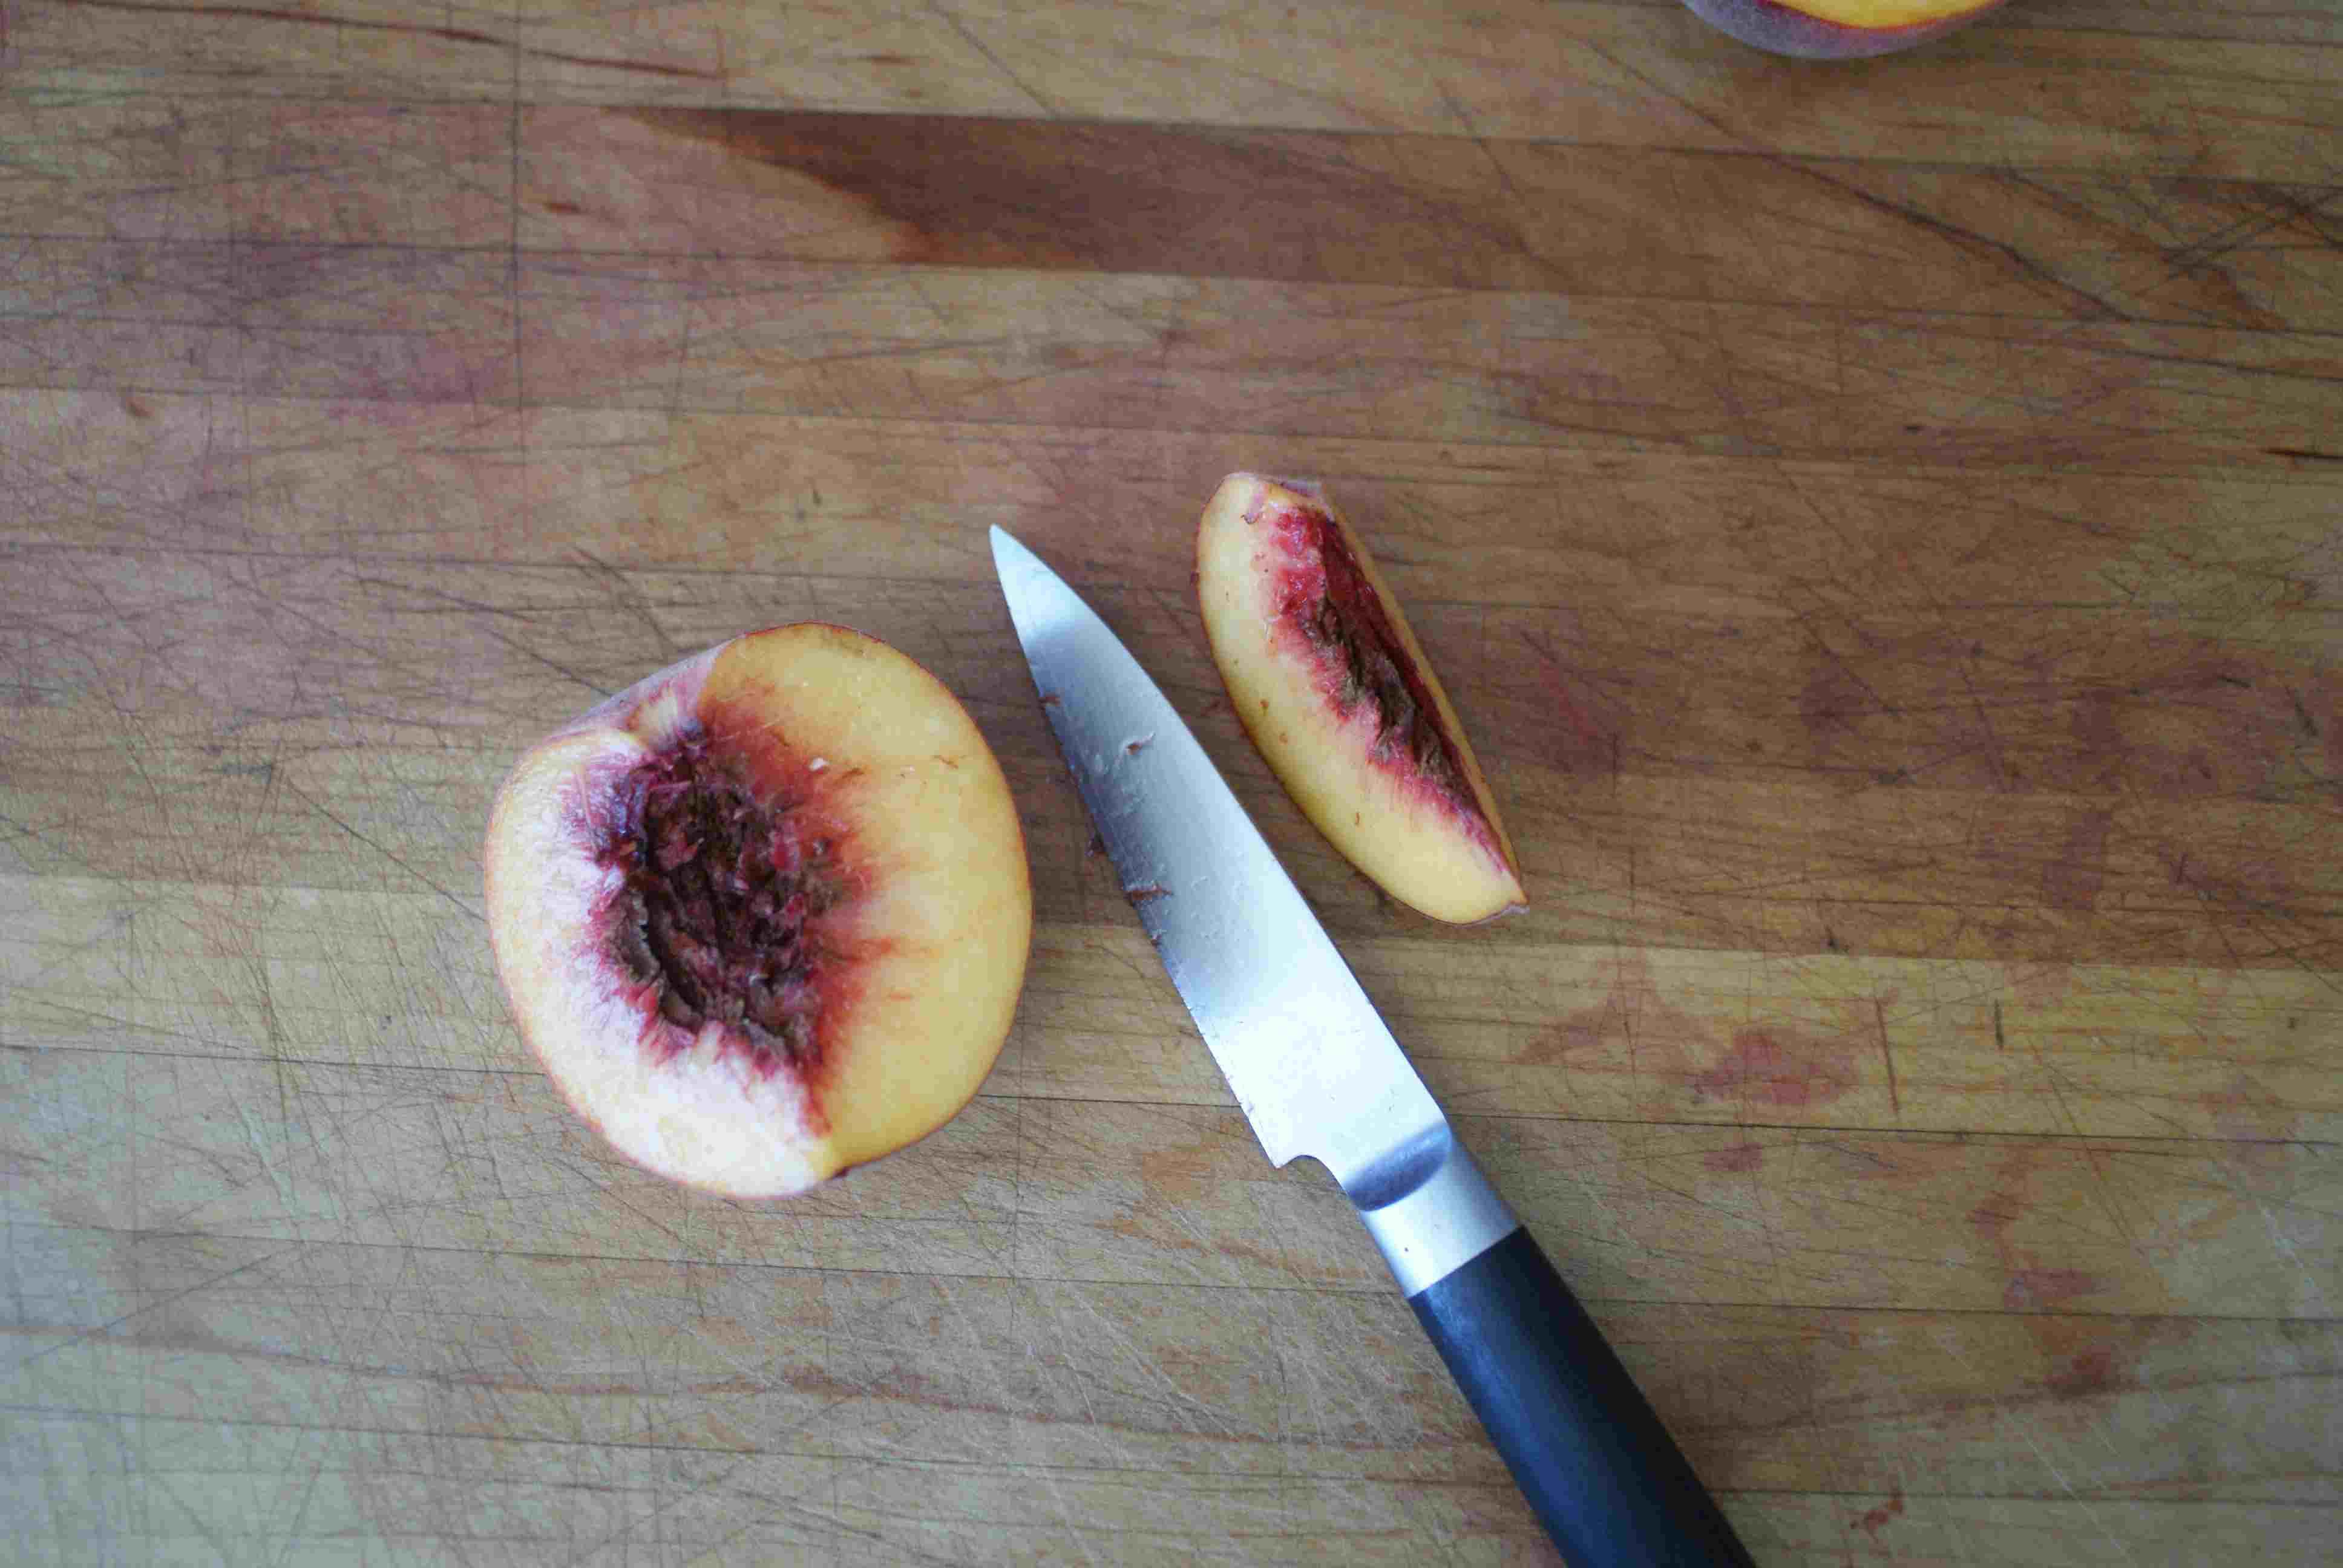 Slicing a Peach